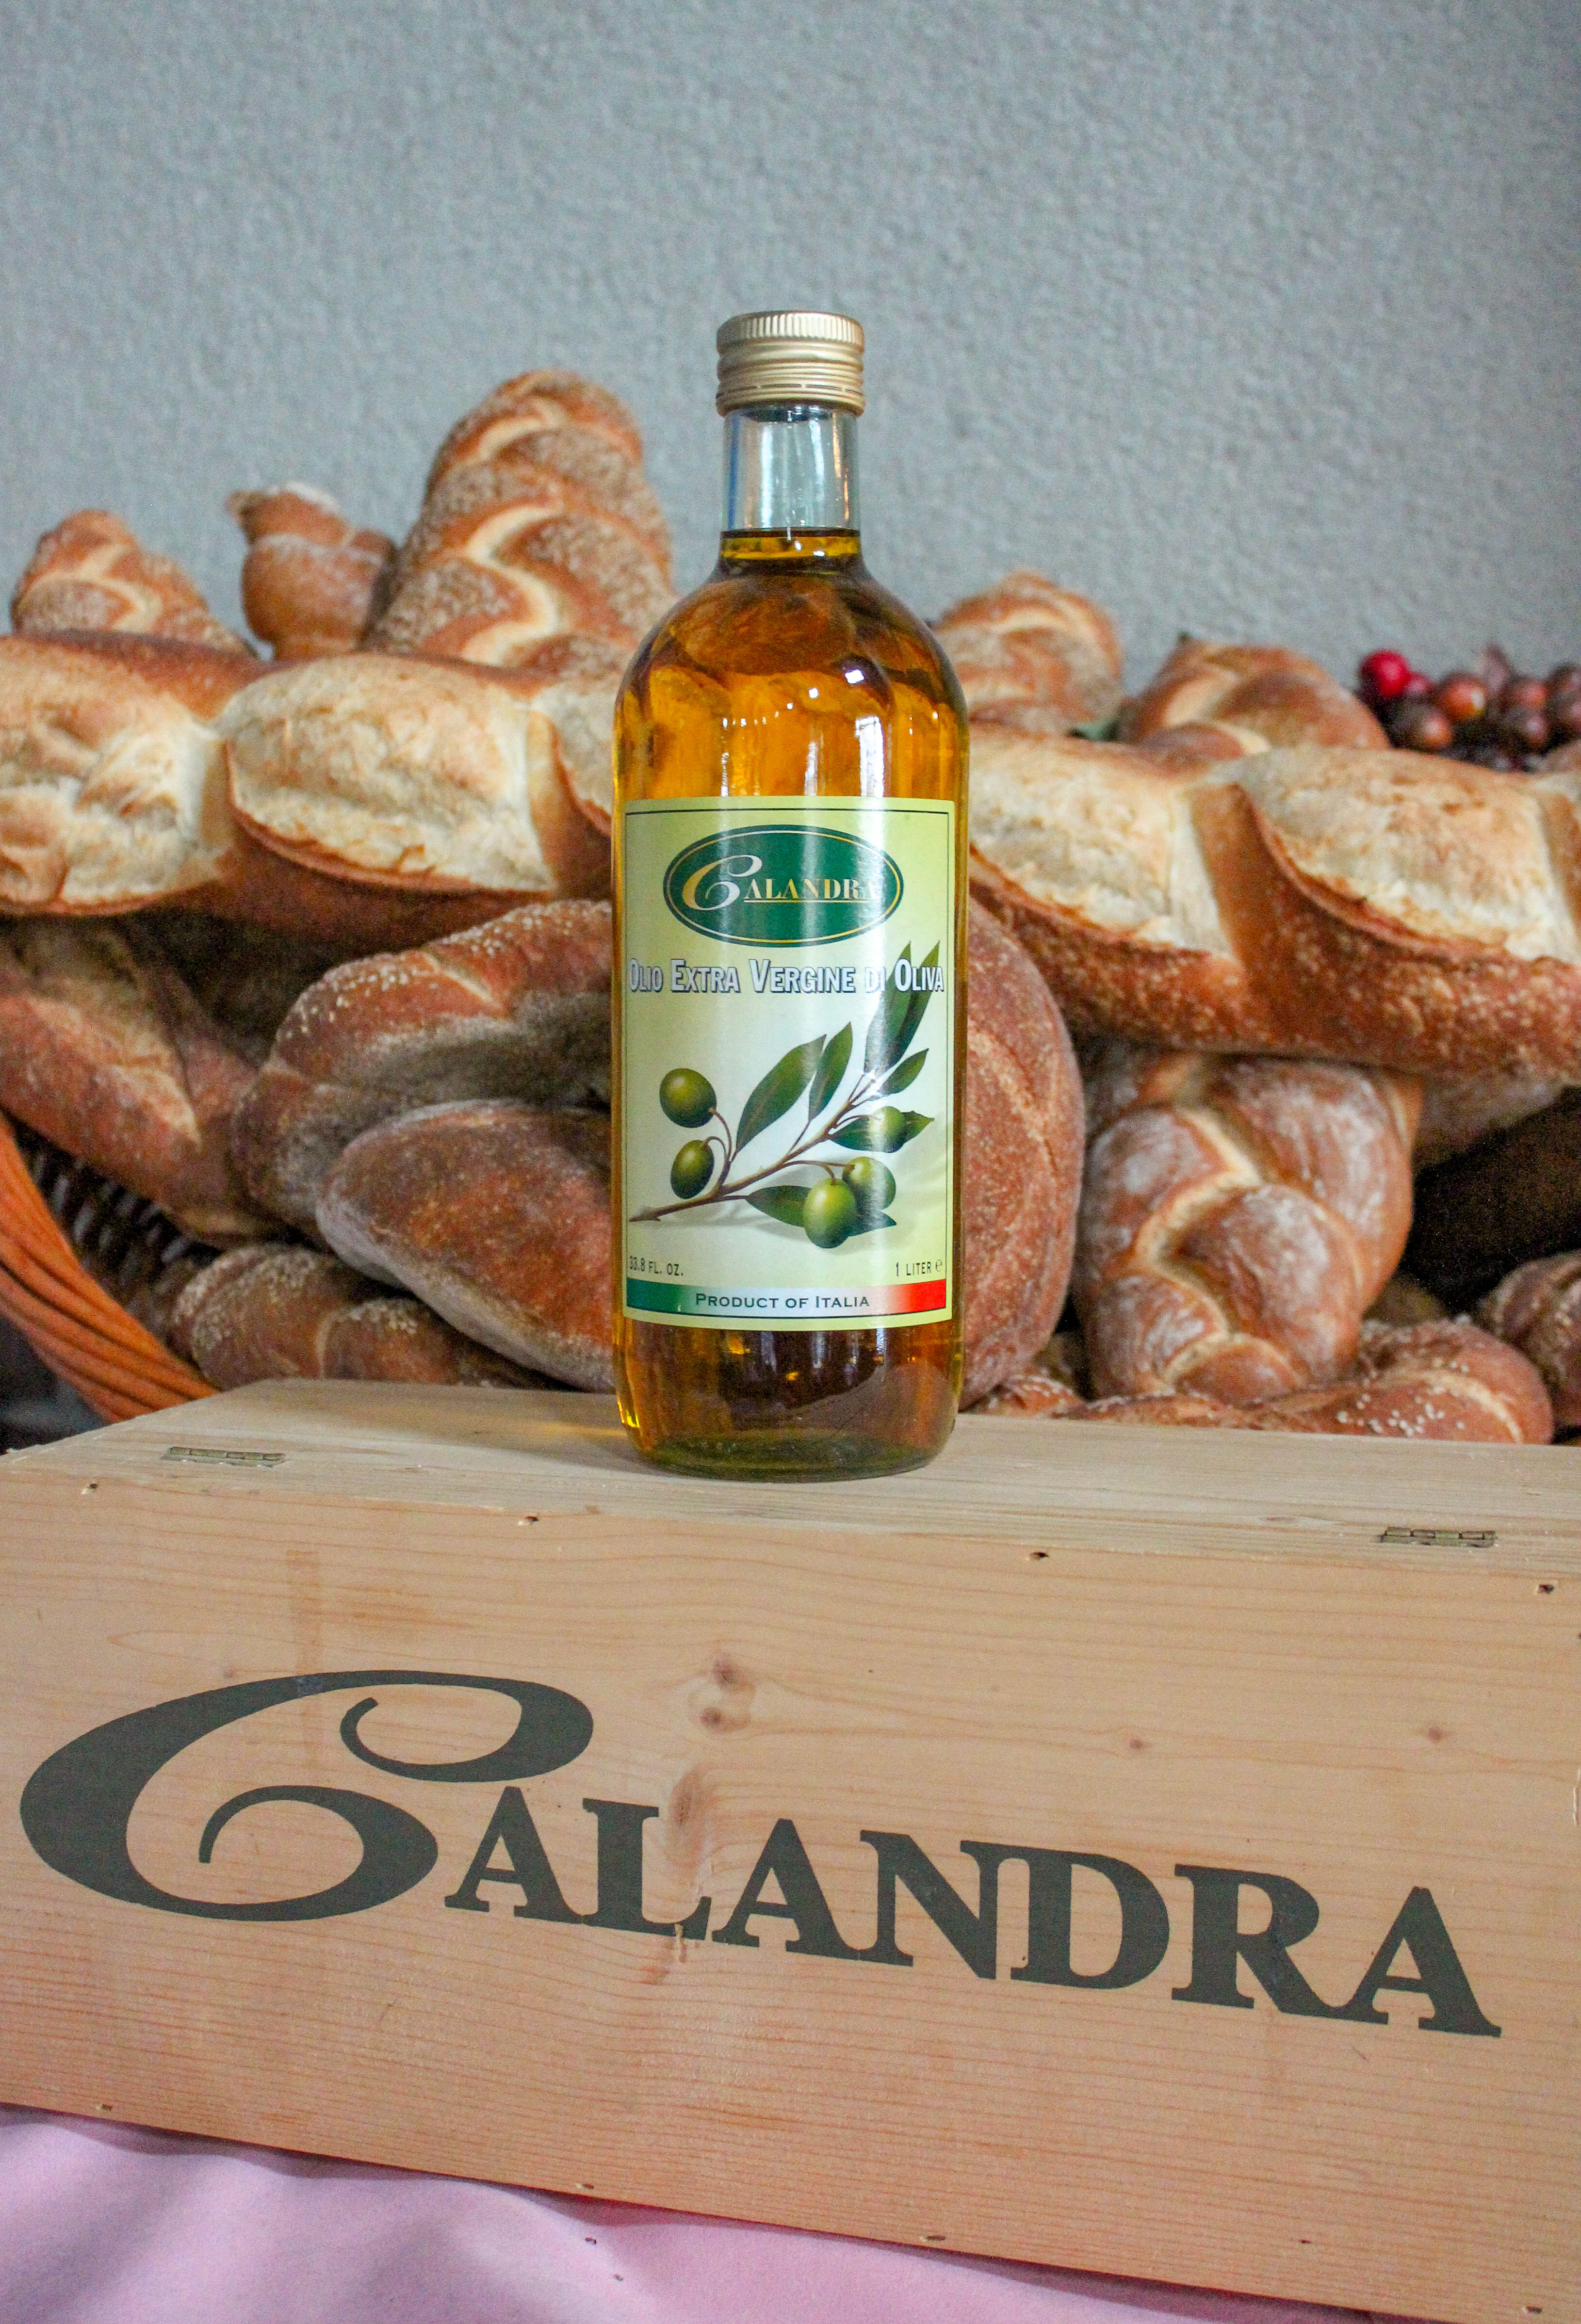 Calandra's Olive Oil